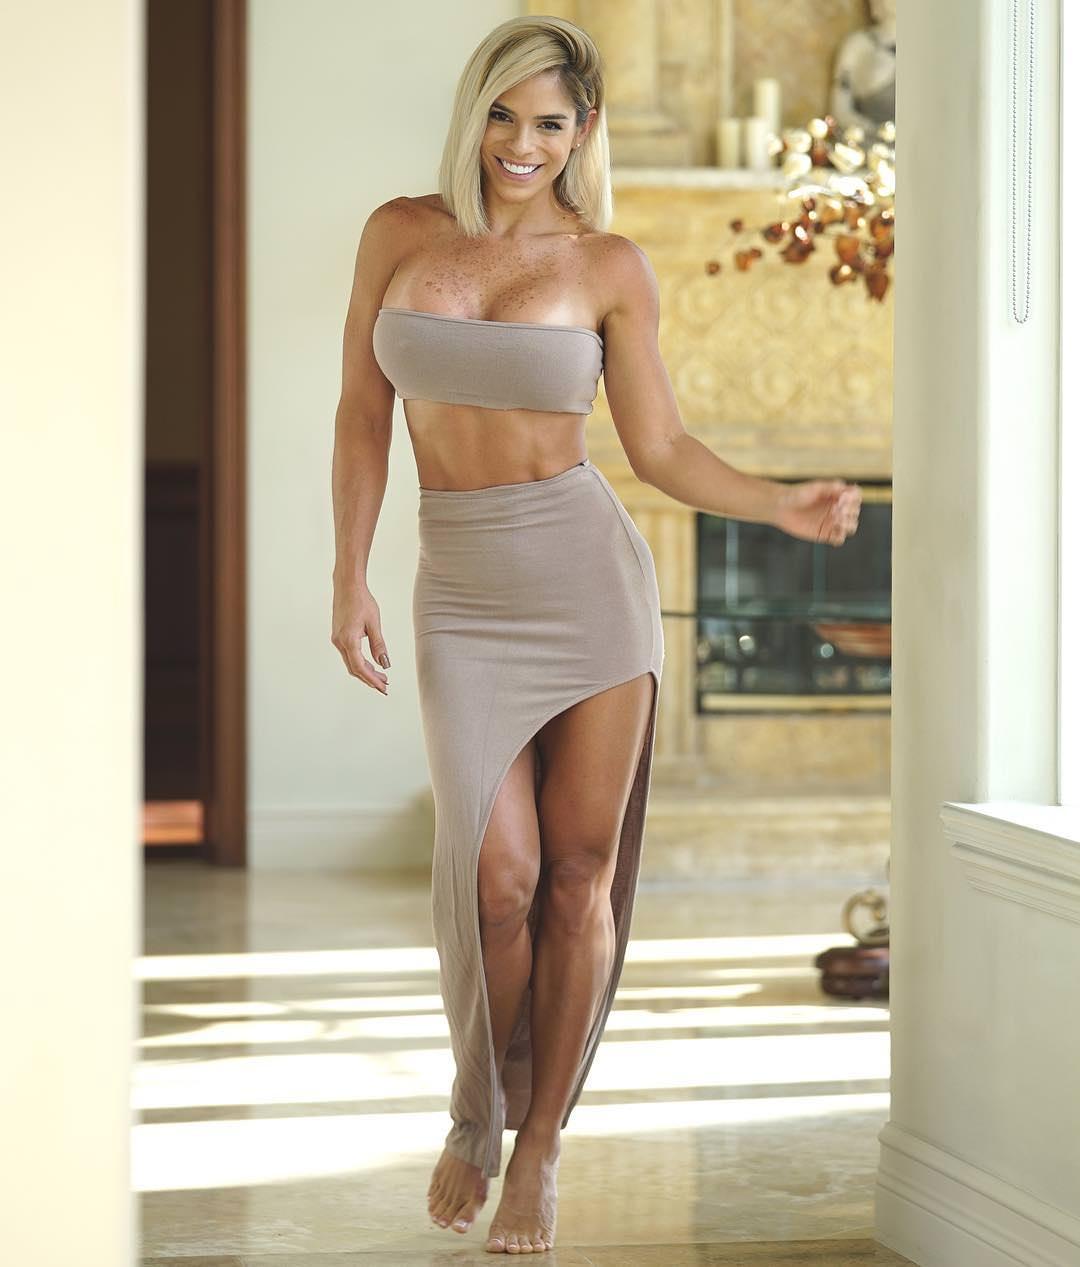 Michelle lewin nude